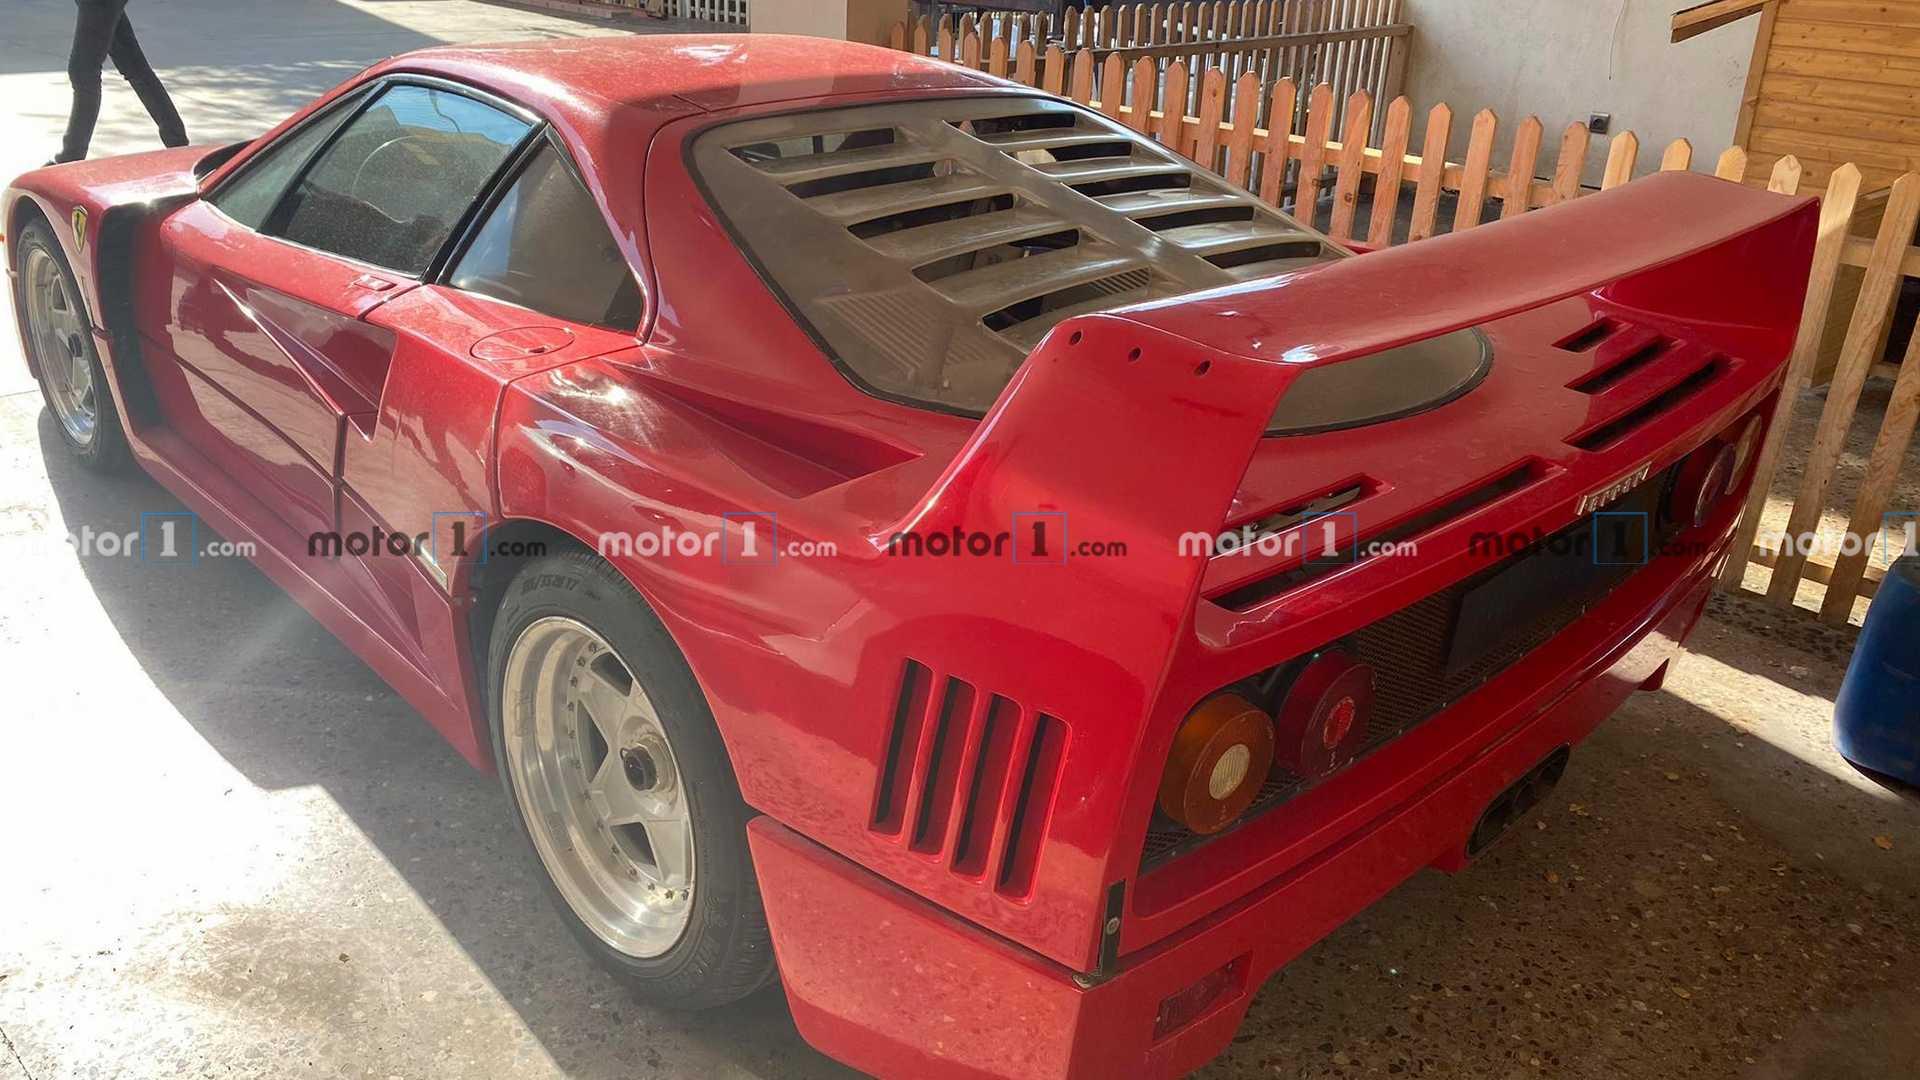 Обнаружен редчайший суперкар Ferrari Саддама Хусейна